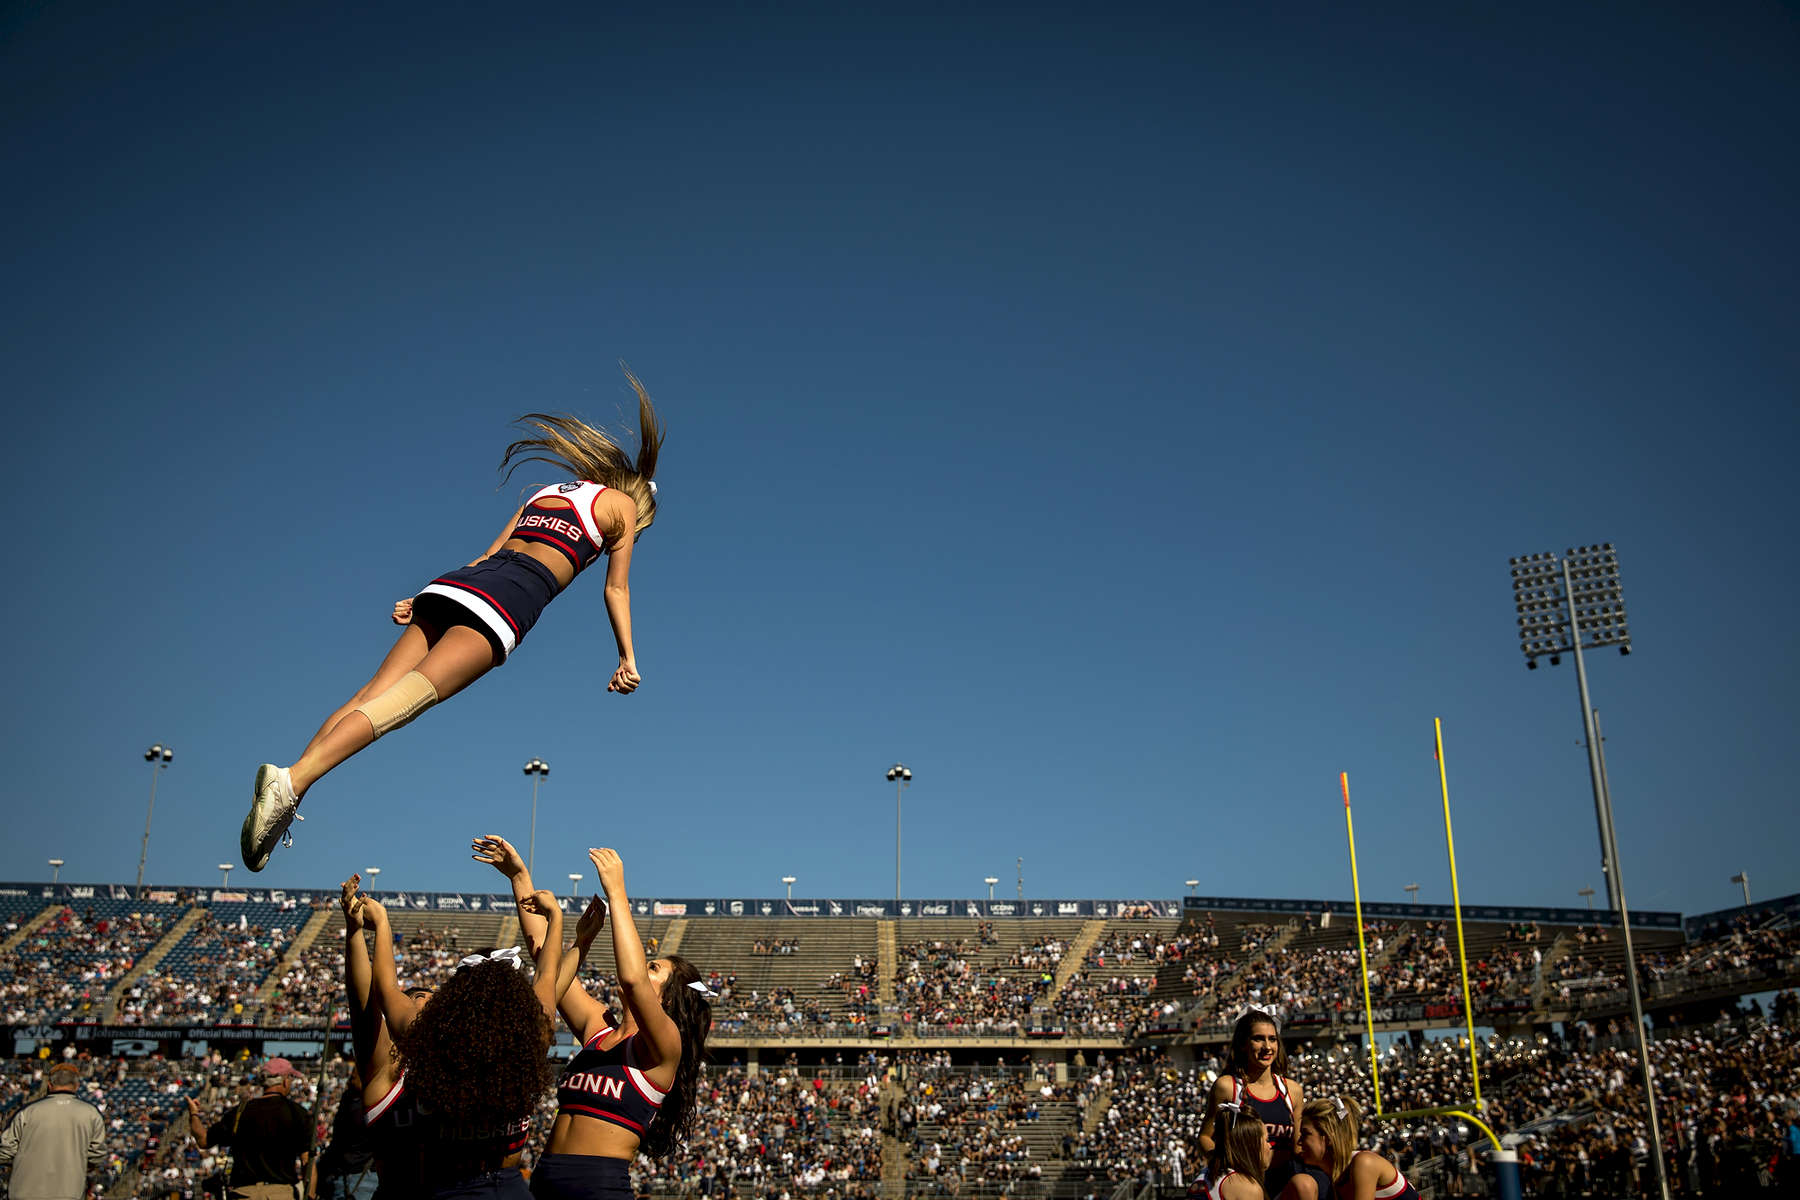 Cheerleaders perform during the UConn Huskies homecoming game against Tulsa Saturday, October 21, 2017 at Rentschler Field in East Hartford.